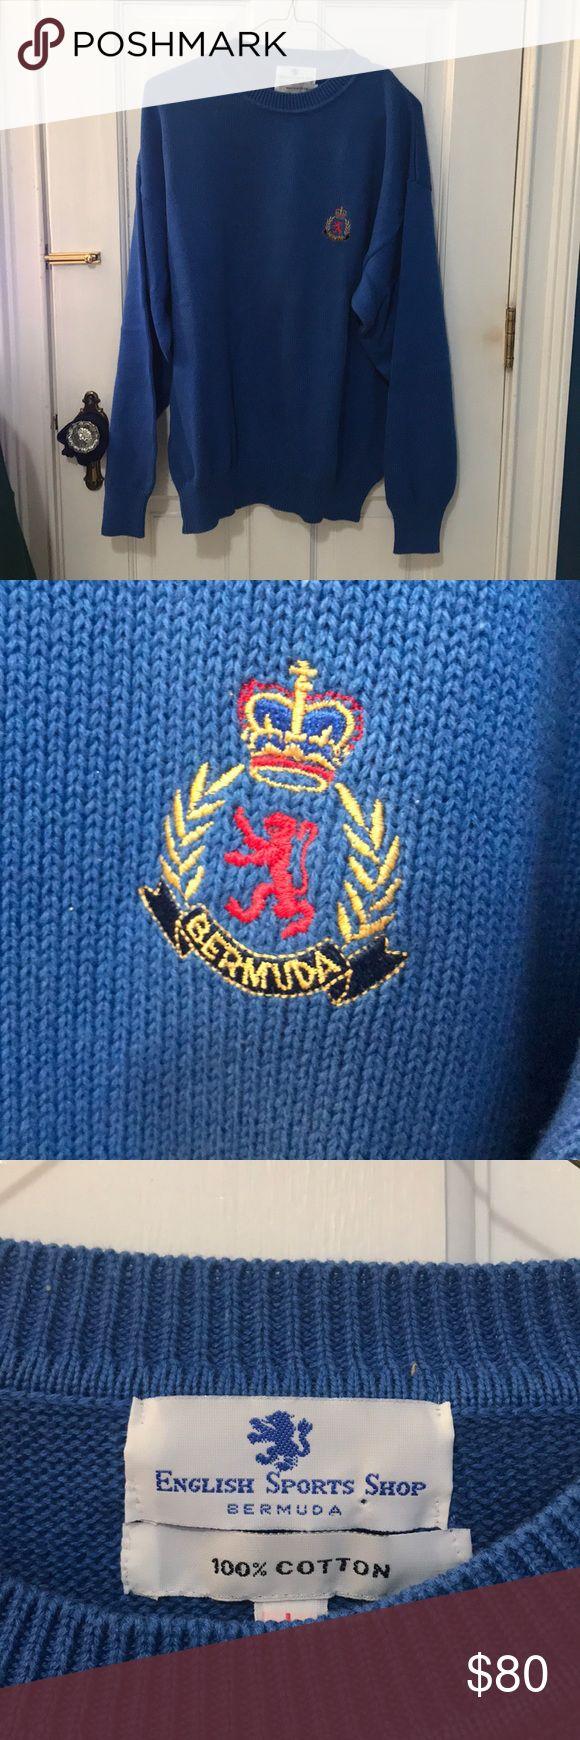 English sports shop Bermuda vintage sweater in 2020